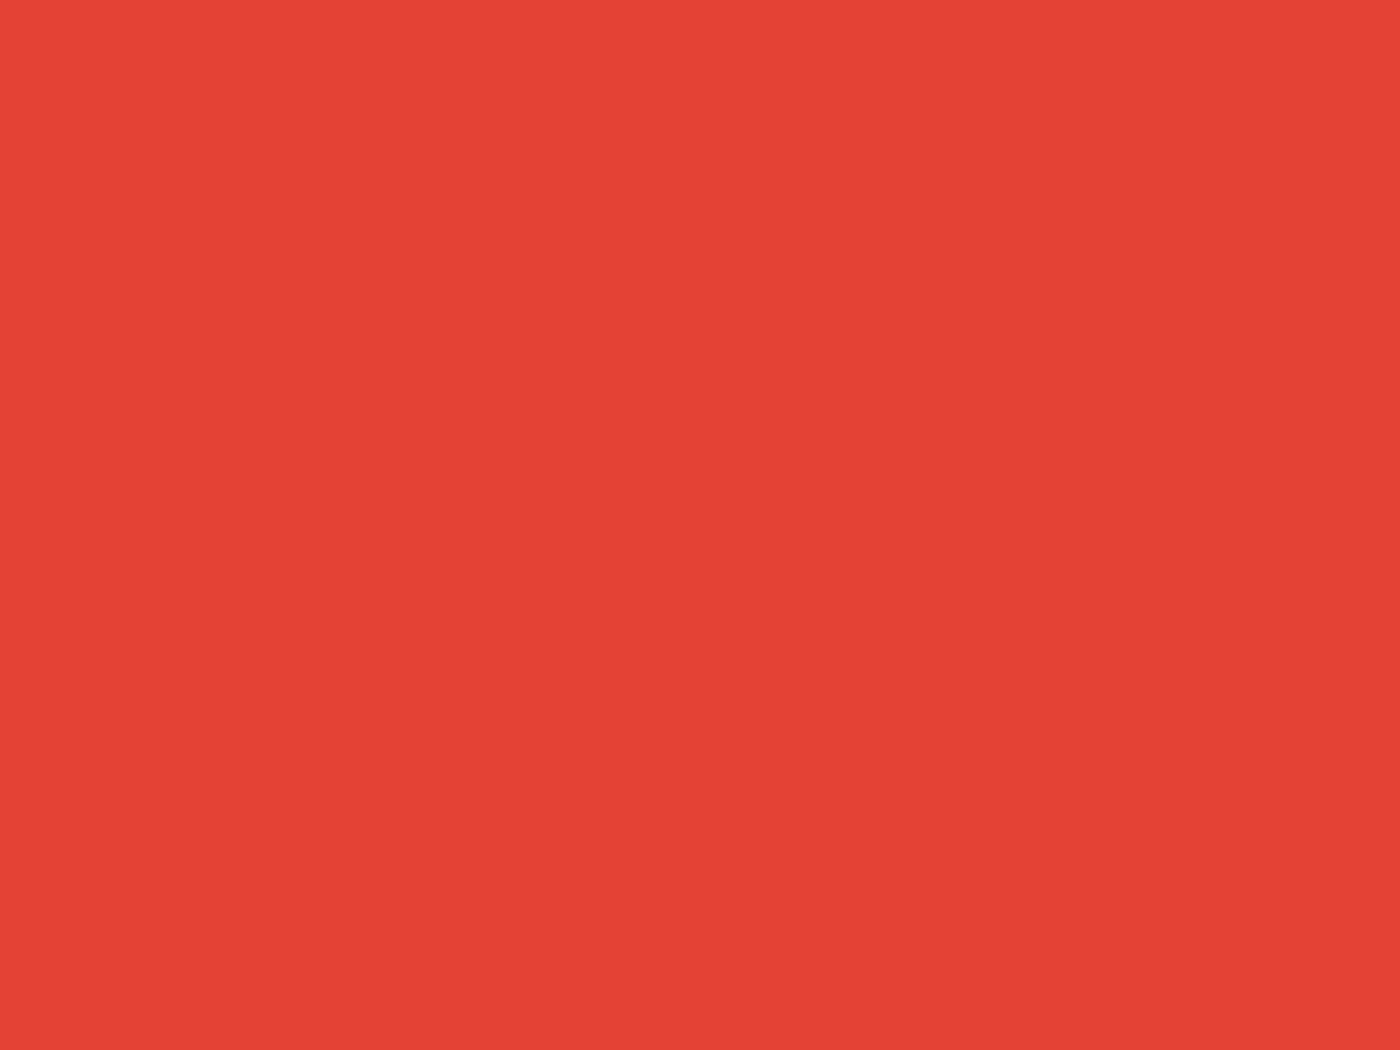 1400x1050 Vermilion Cinnabar Solid Color Background